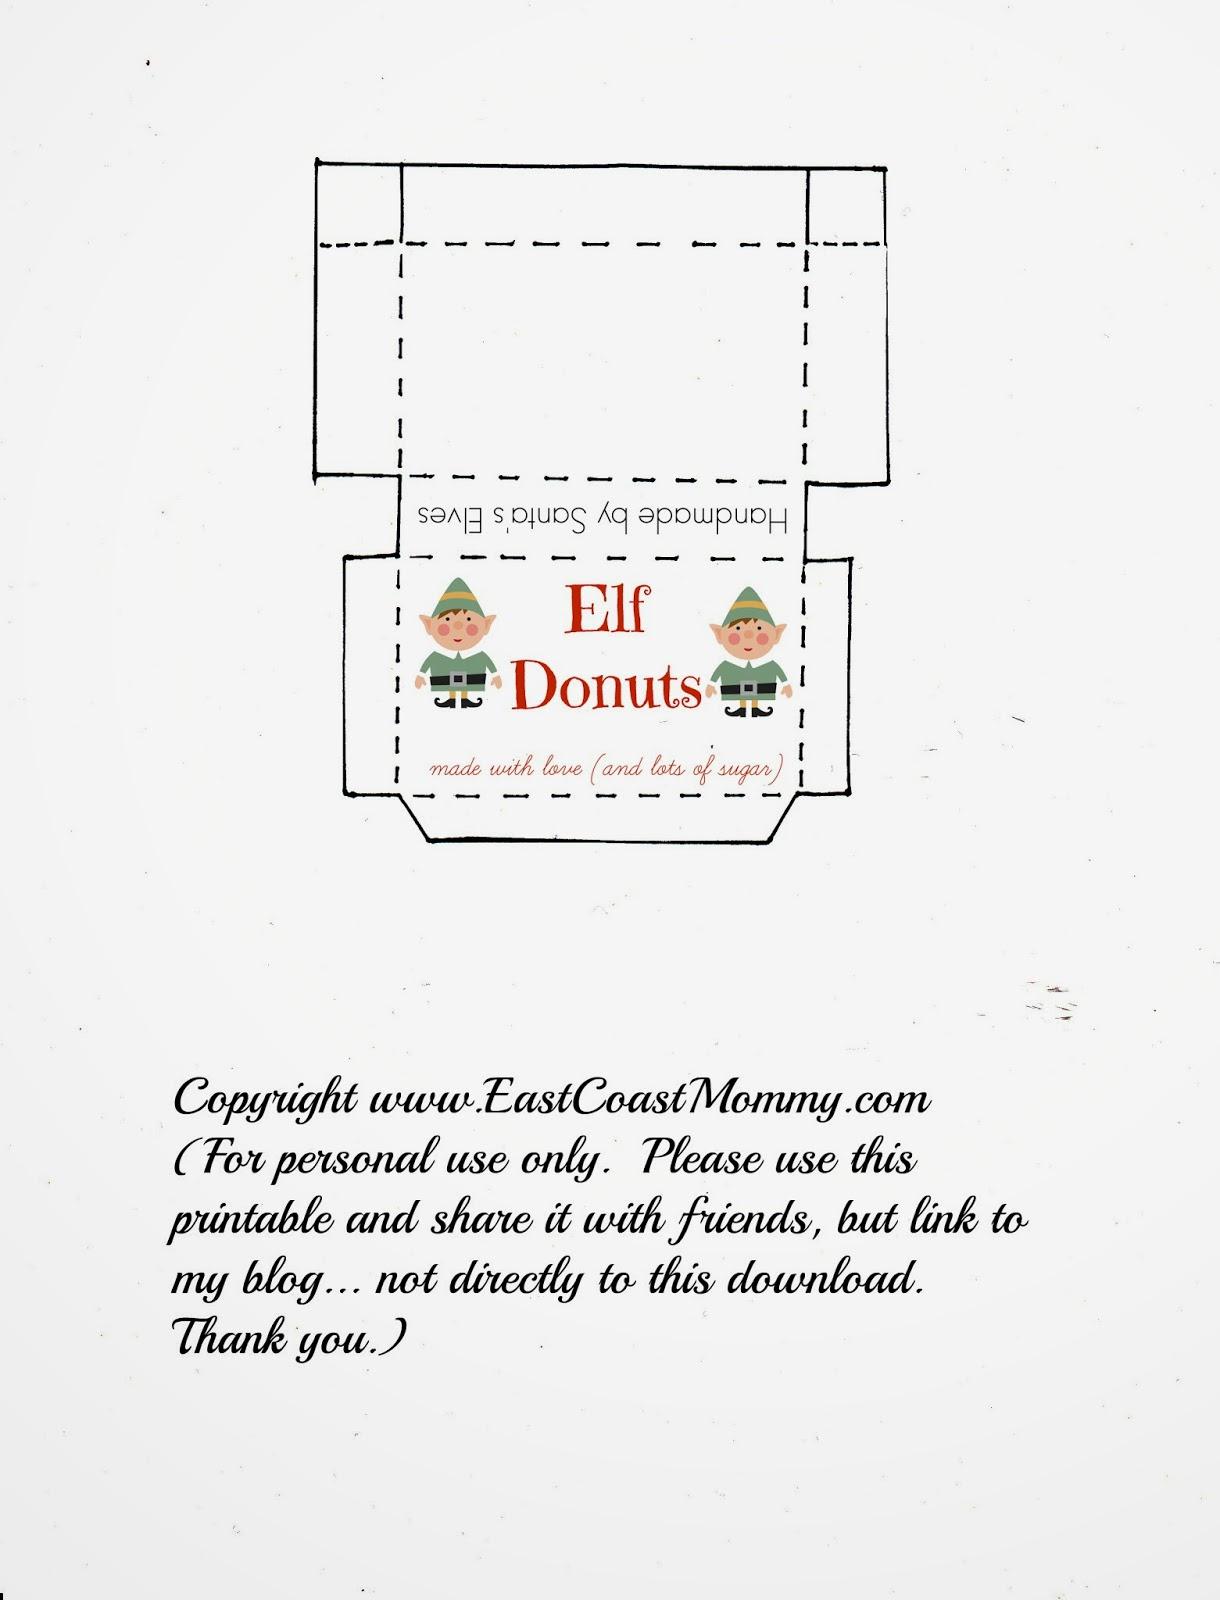 East Coast Mommy Elf On The Shelf Donuts Free Printable Box